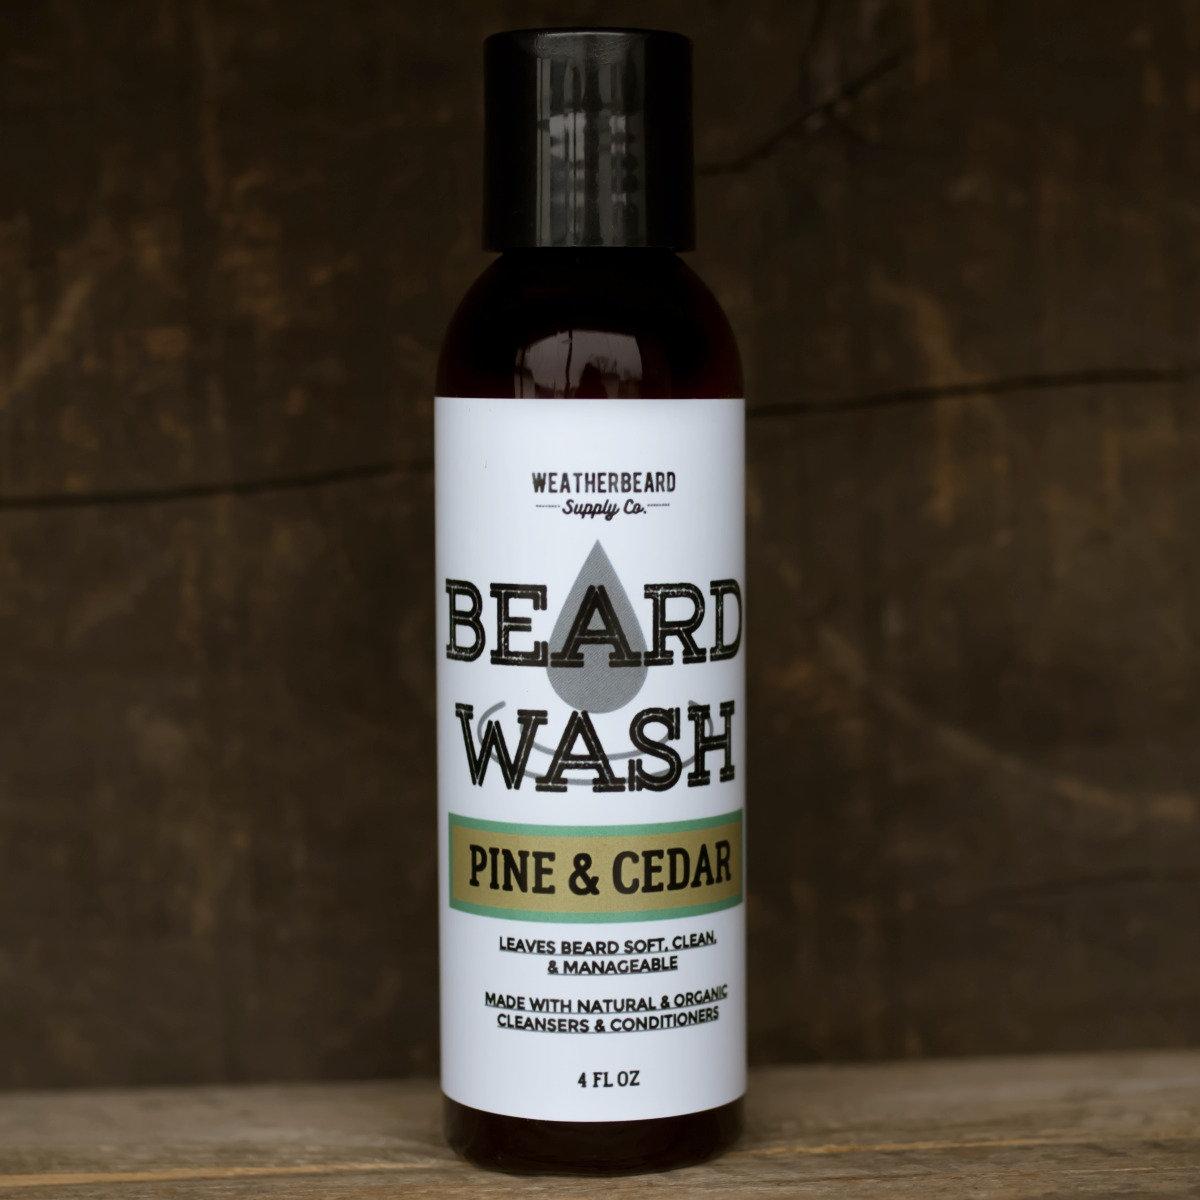 PINE & CEDAR BEARD WASH